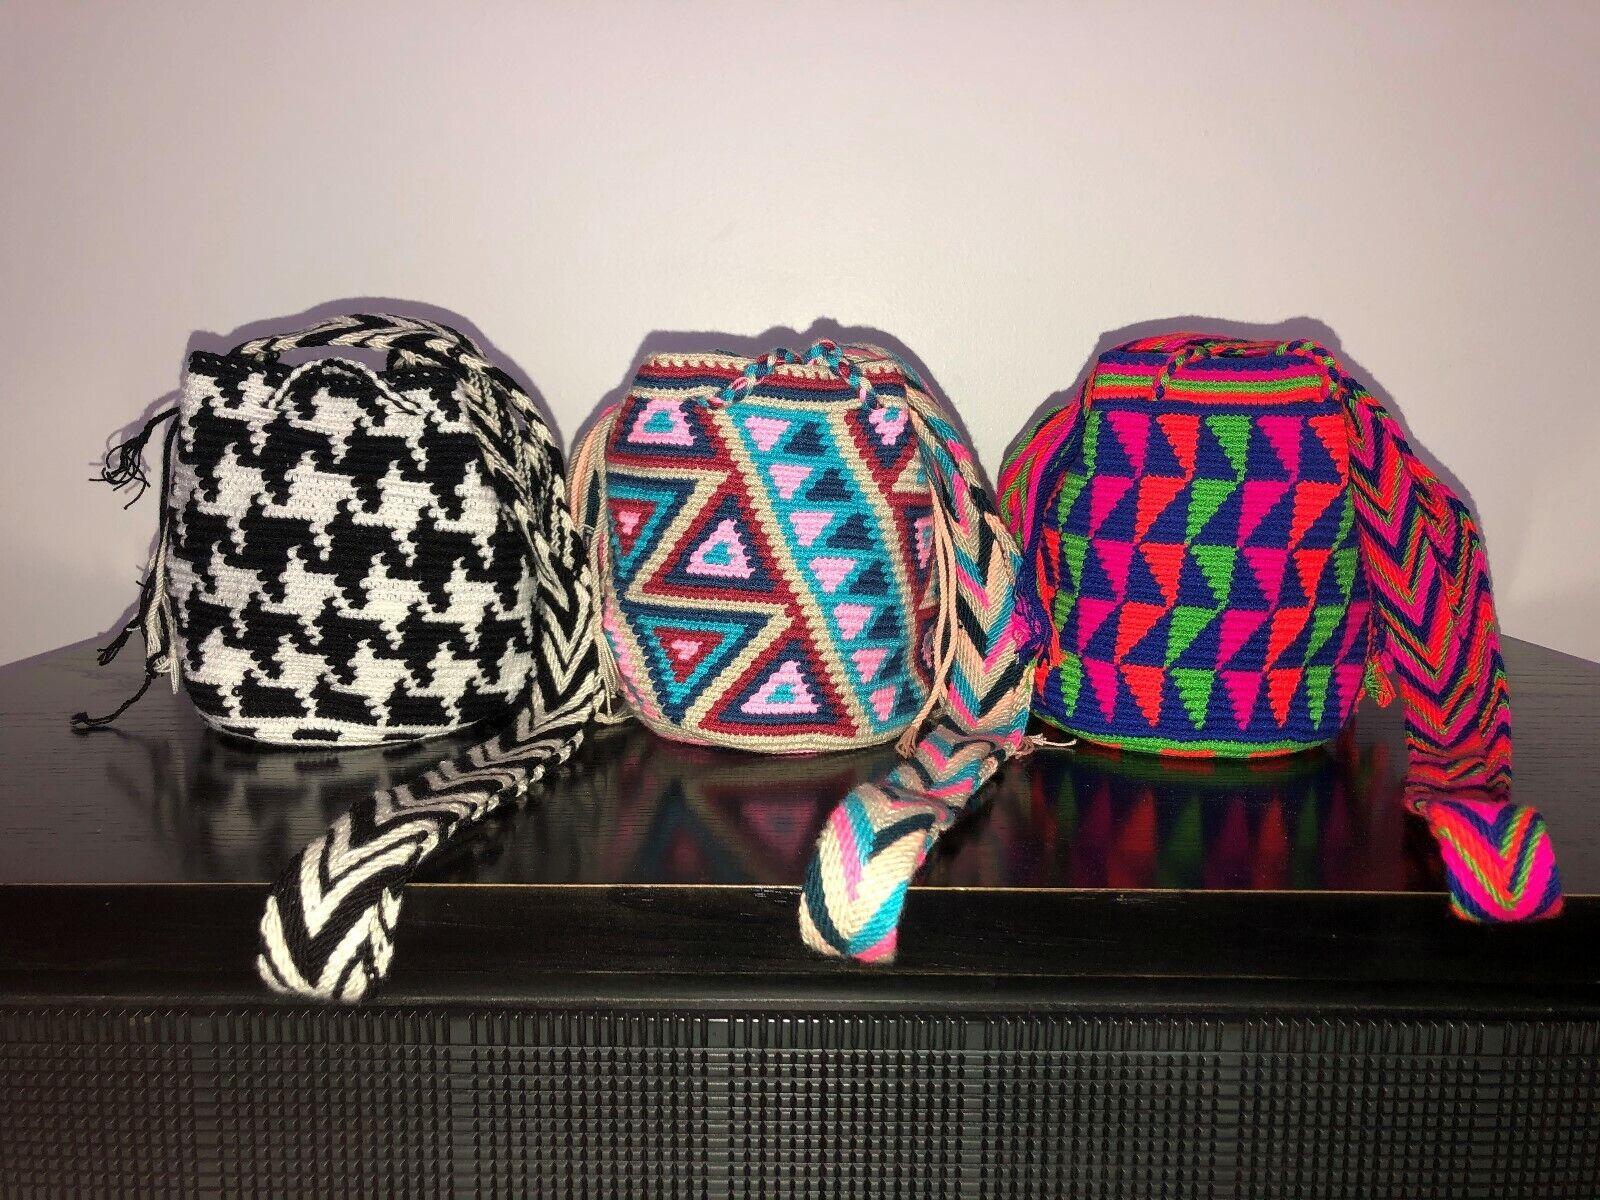 new 3 choices Authentic 100 Wayuu Mochila Colombian bag smallmini tassels